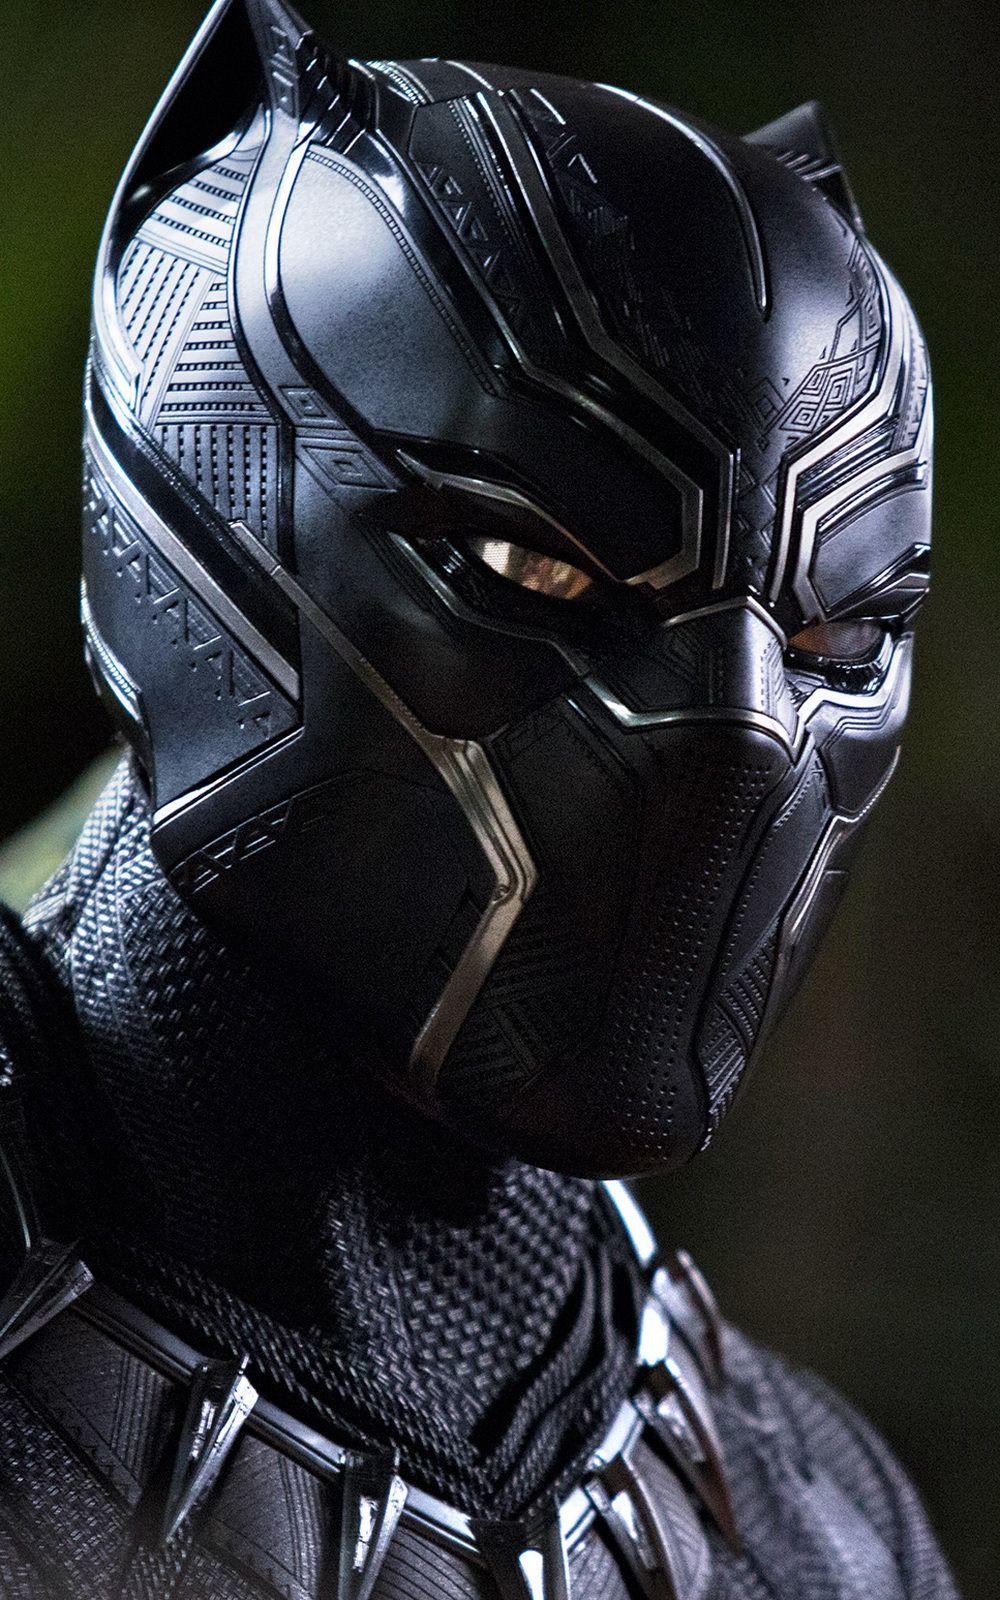 24 Black Panther Marvel Mobile Wallpapers On Wallpapersafari